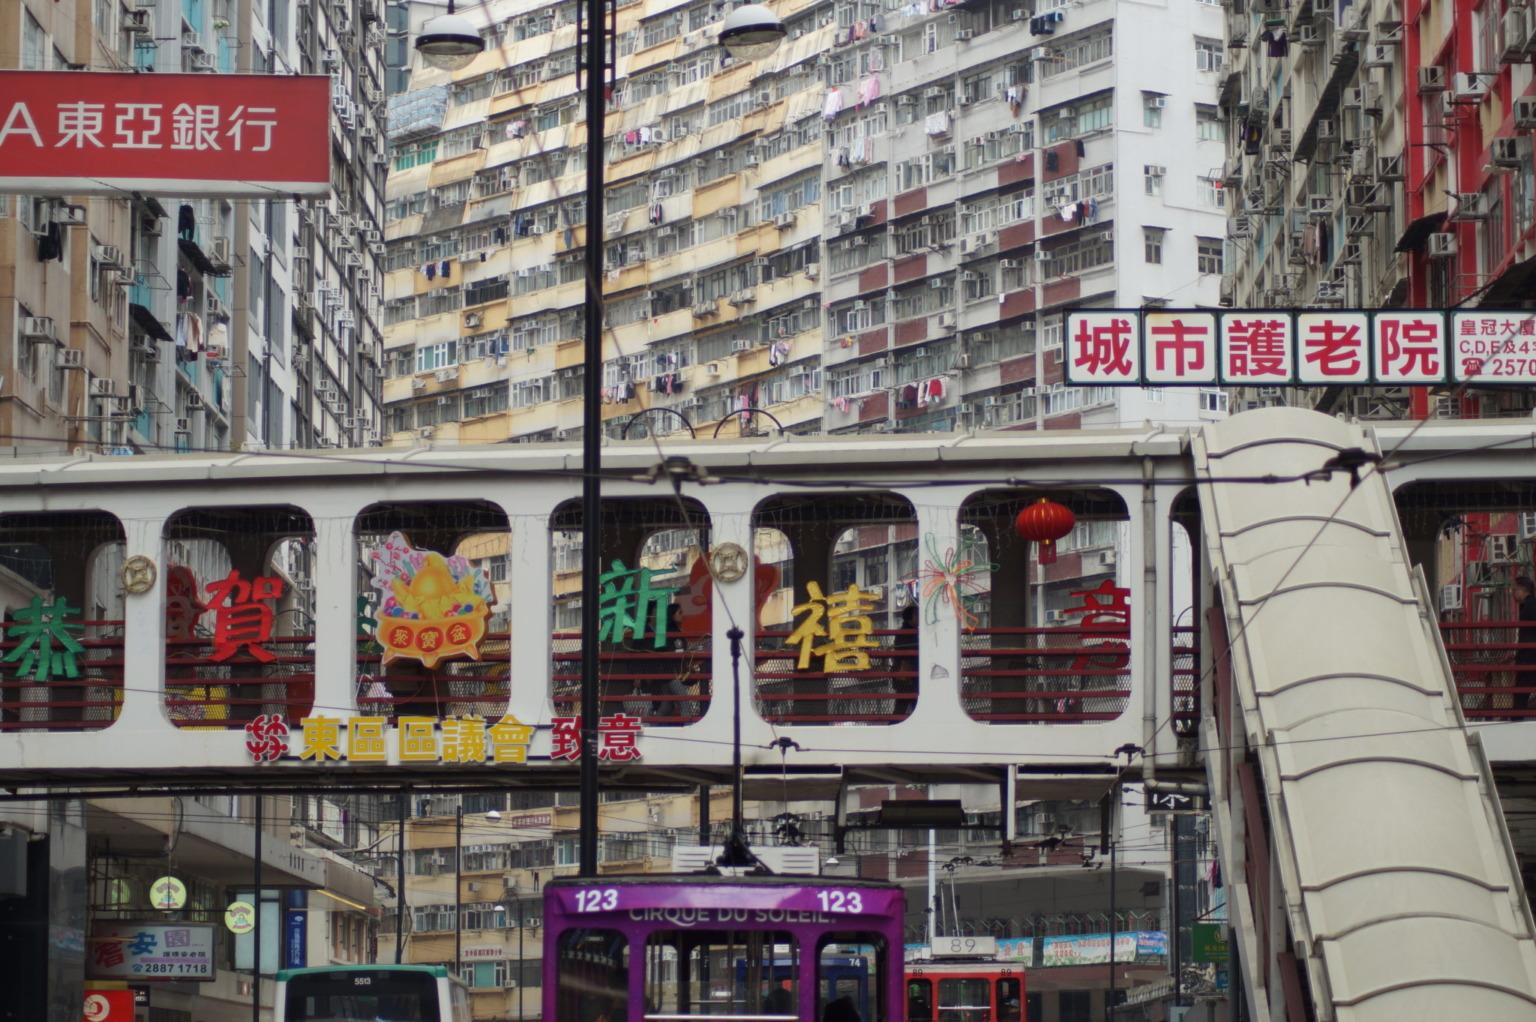 Hongkong ist immer ein tolles Reiseziel